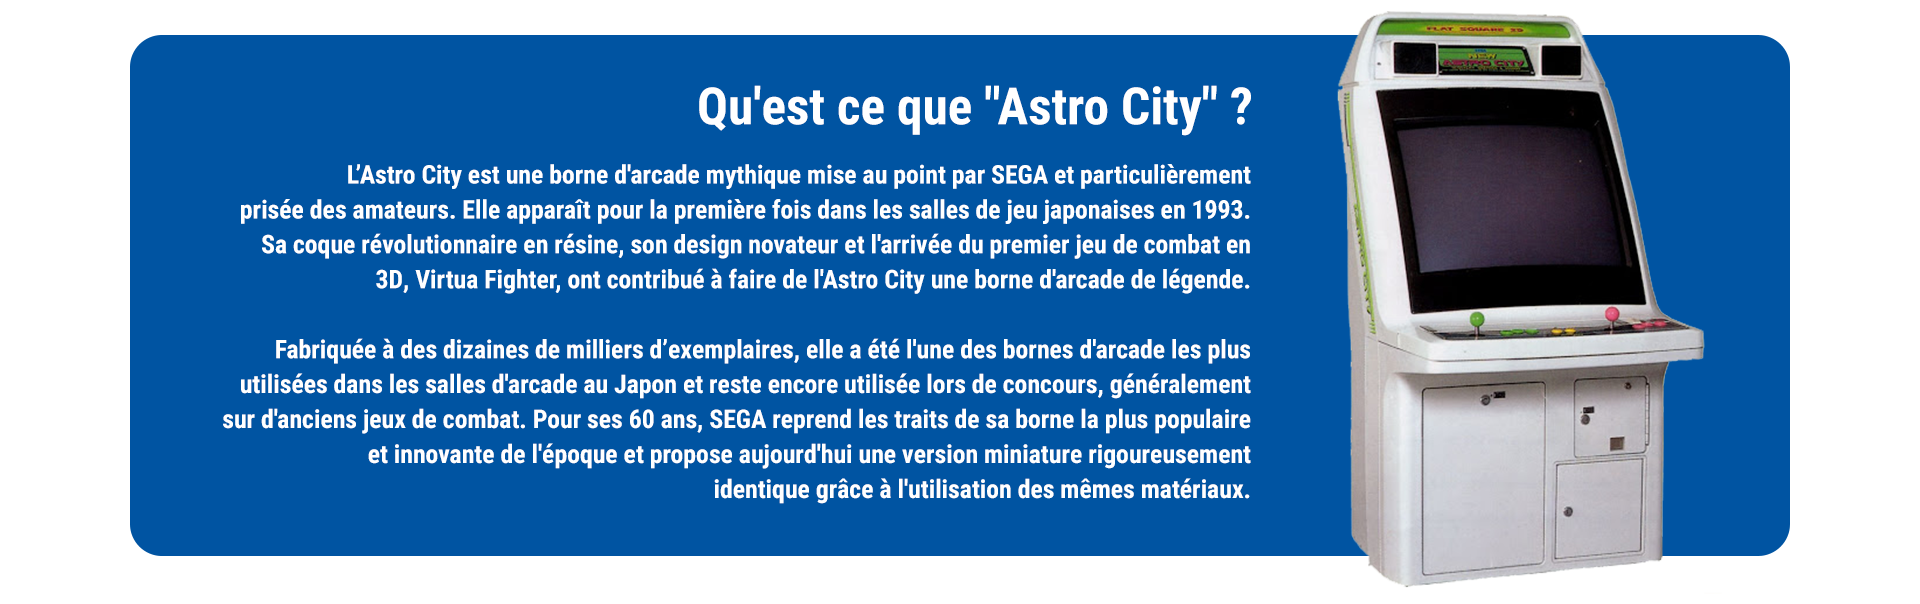 Astro City 1993 ©SEGATOYS